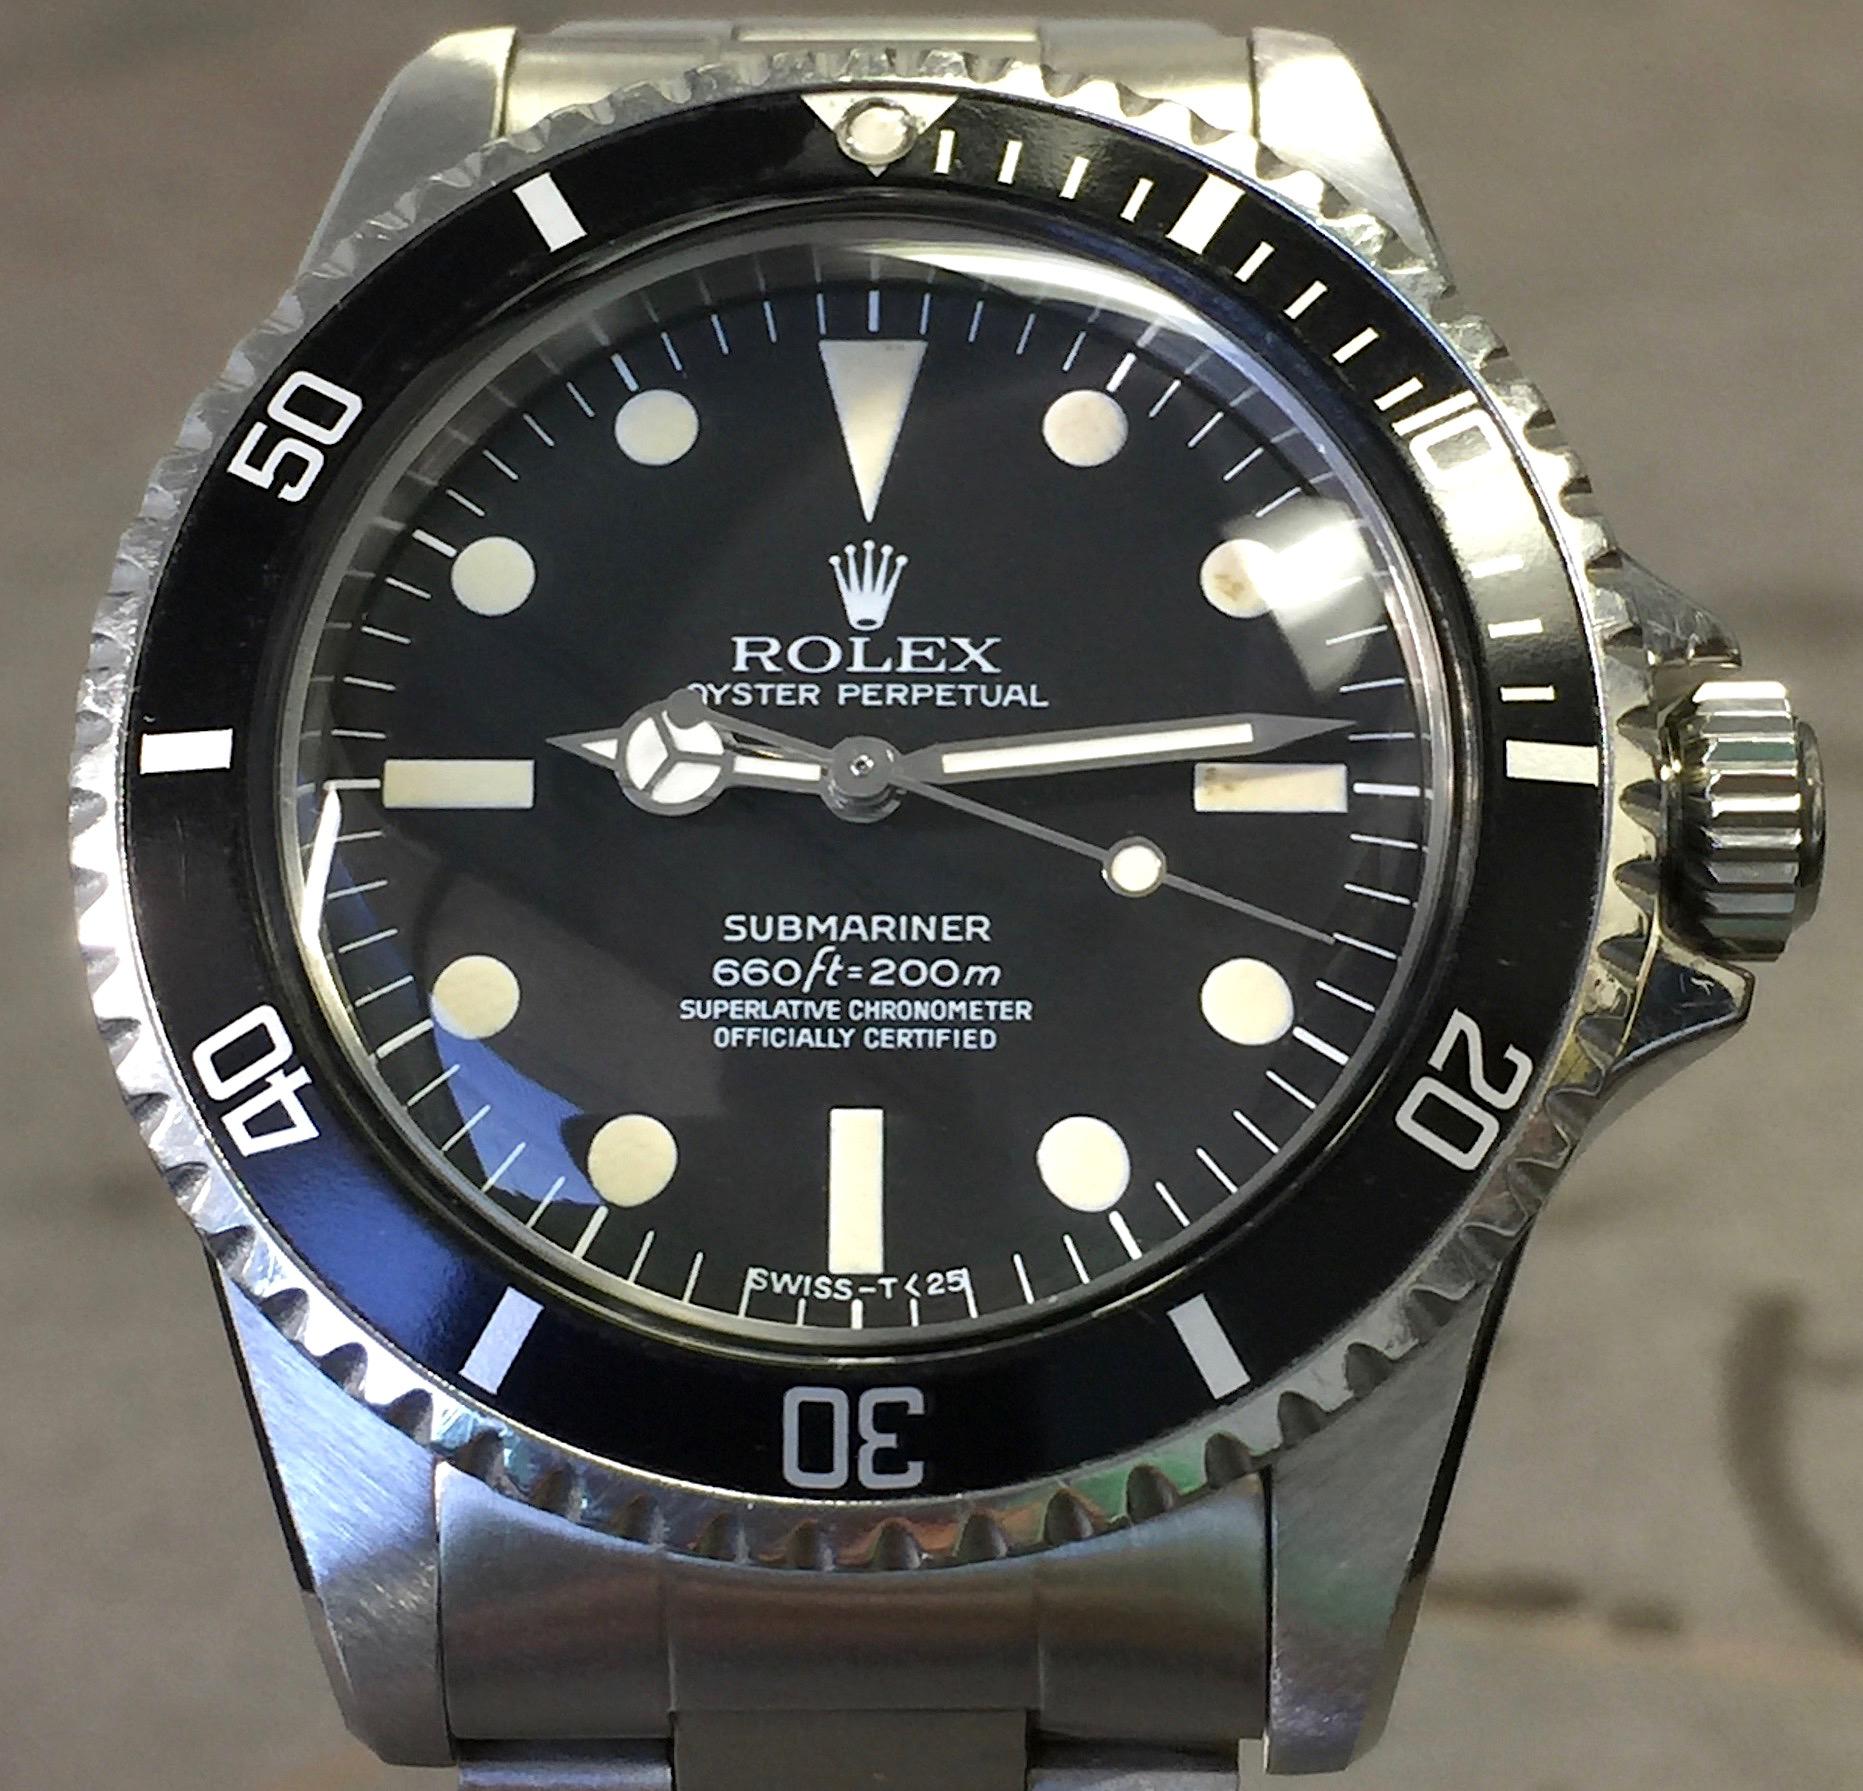 Vintage Rolex Submariner 5512 Black Dialbezel Pointed Crown Guard